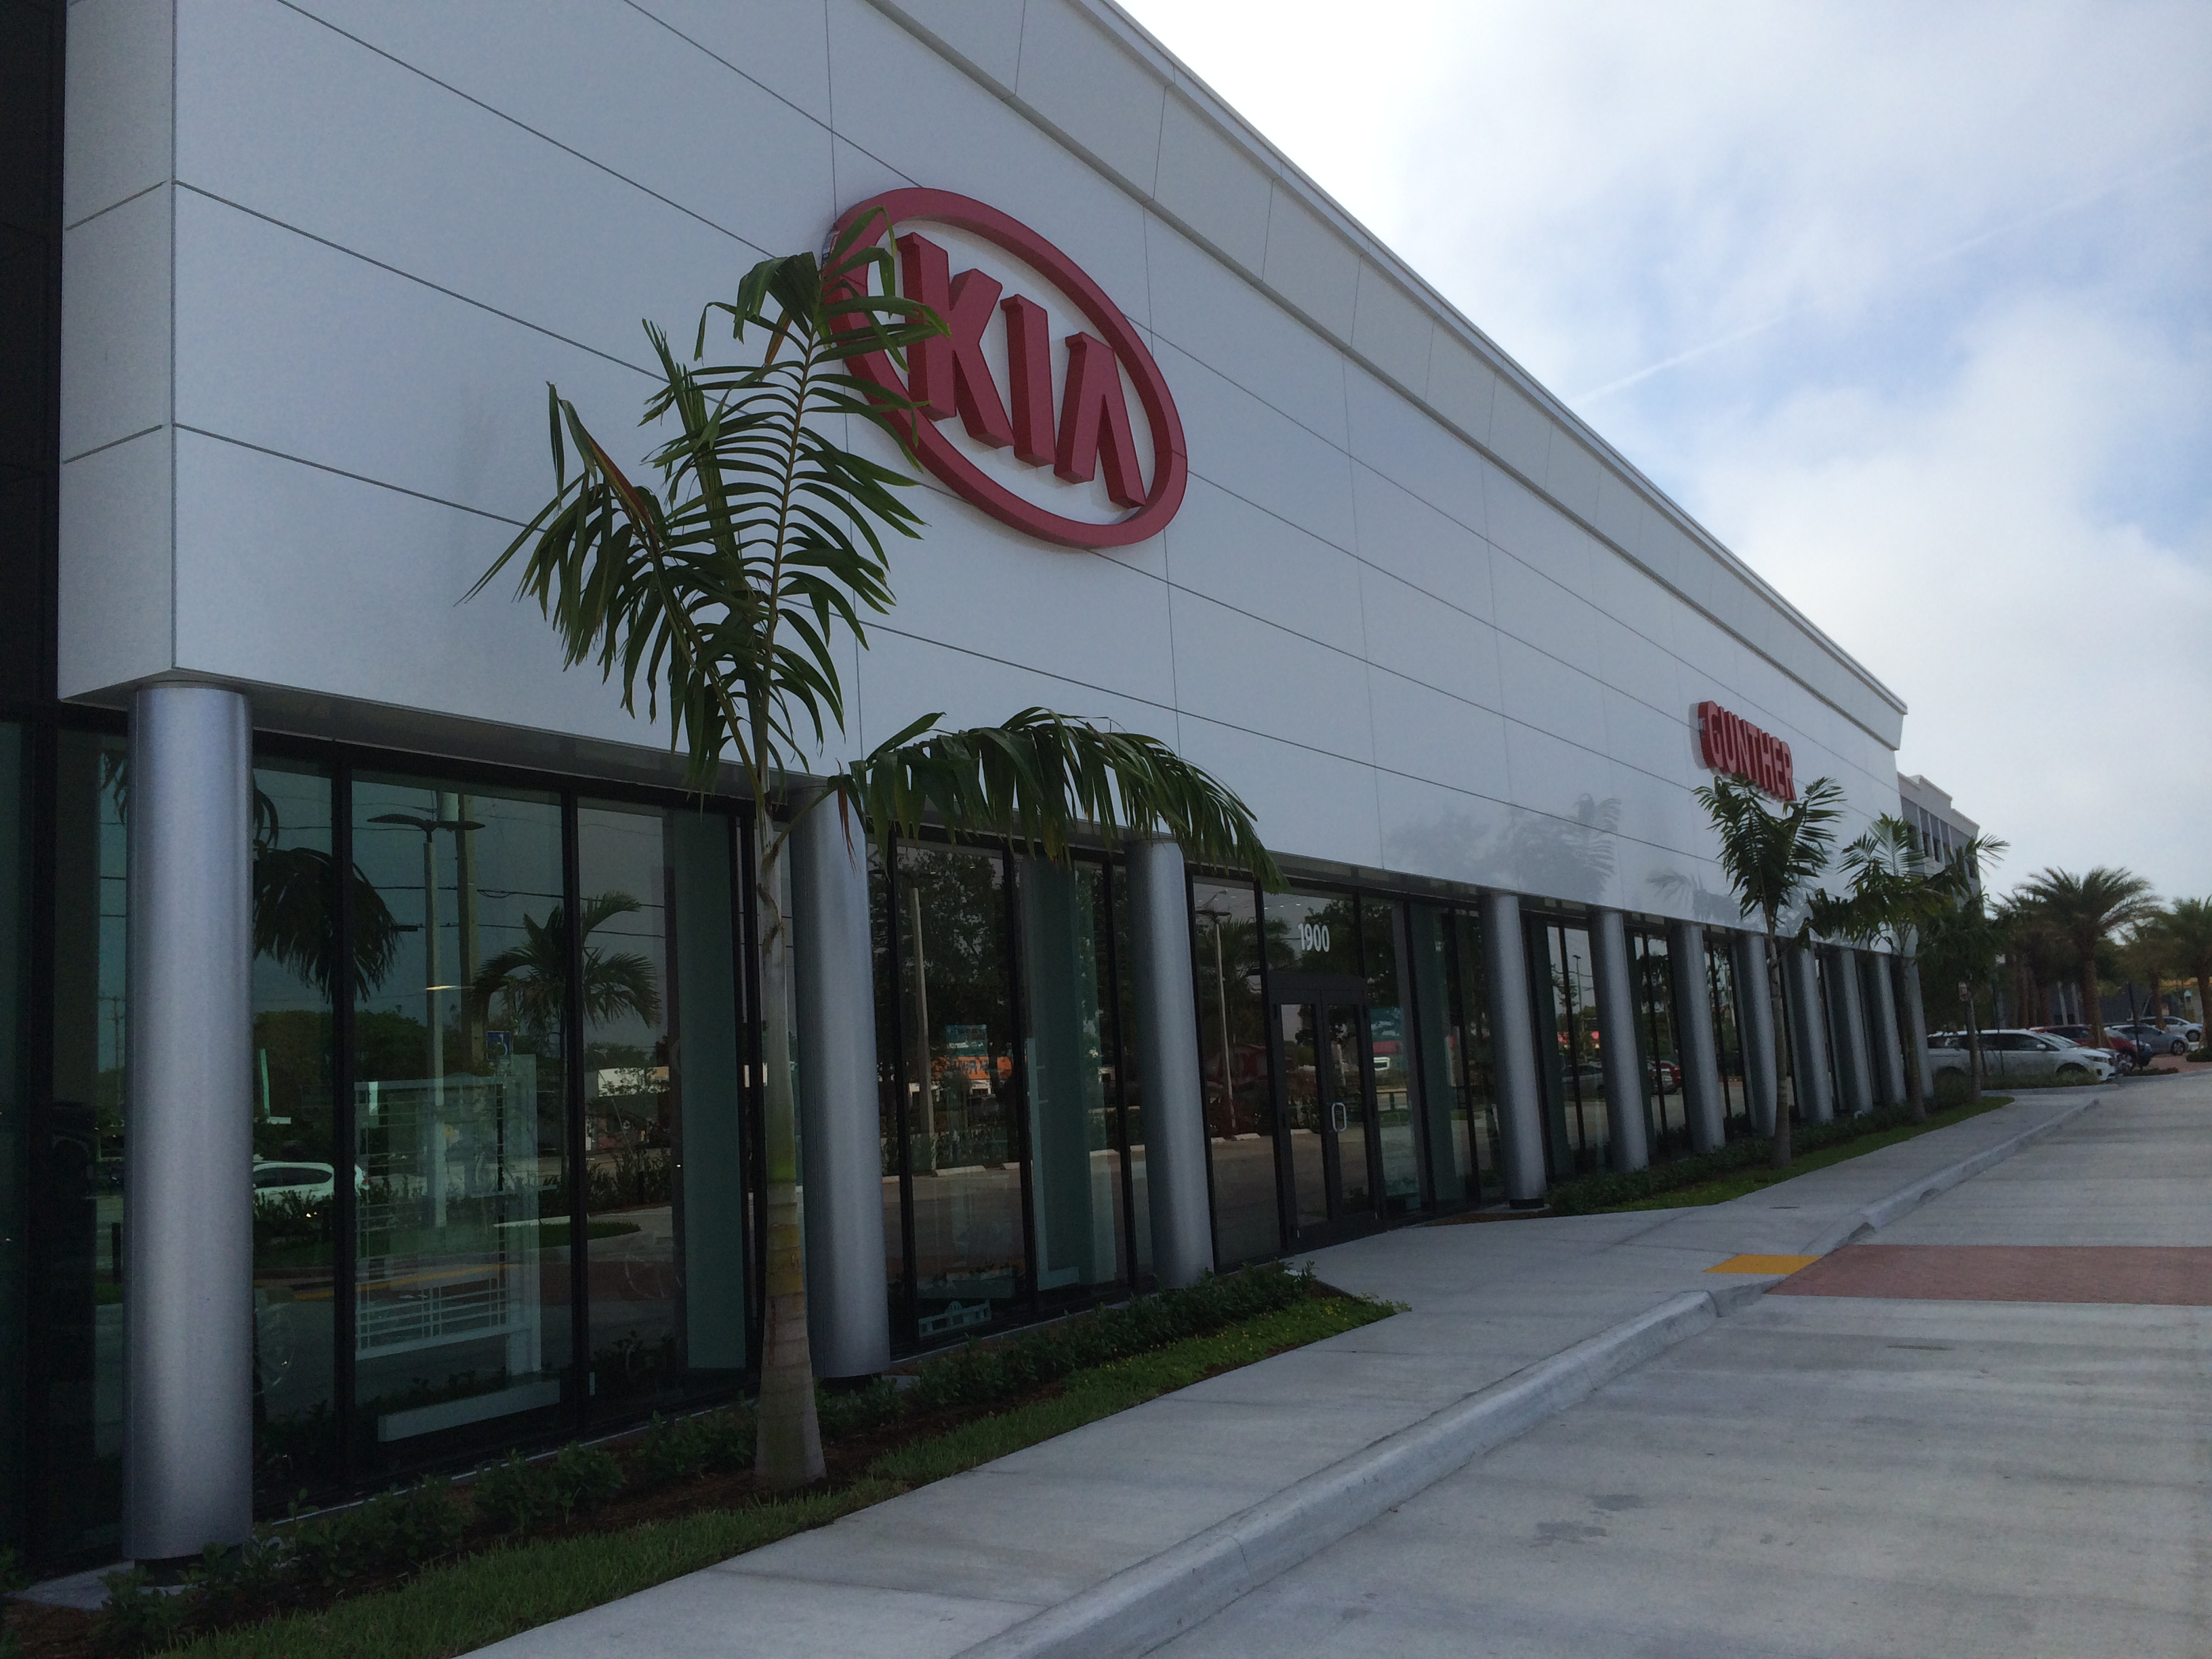 Kia Gunther (Fort Lauderdale)